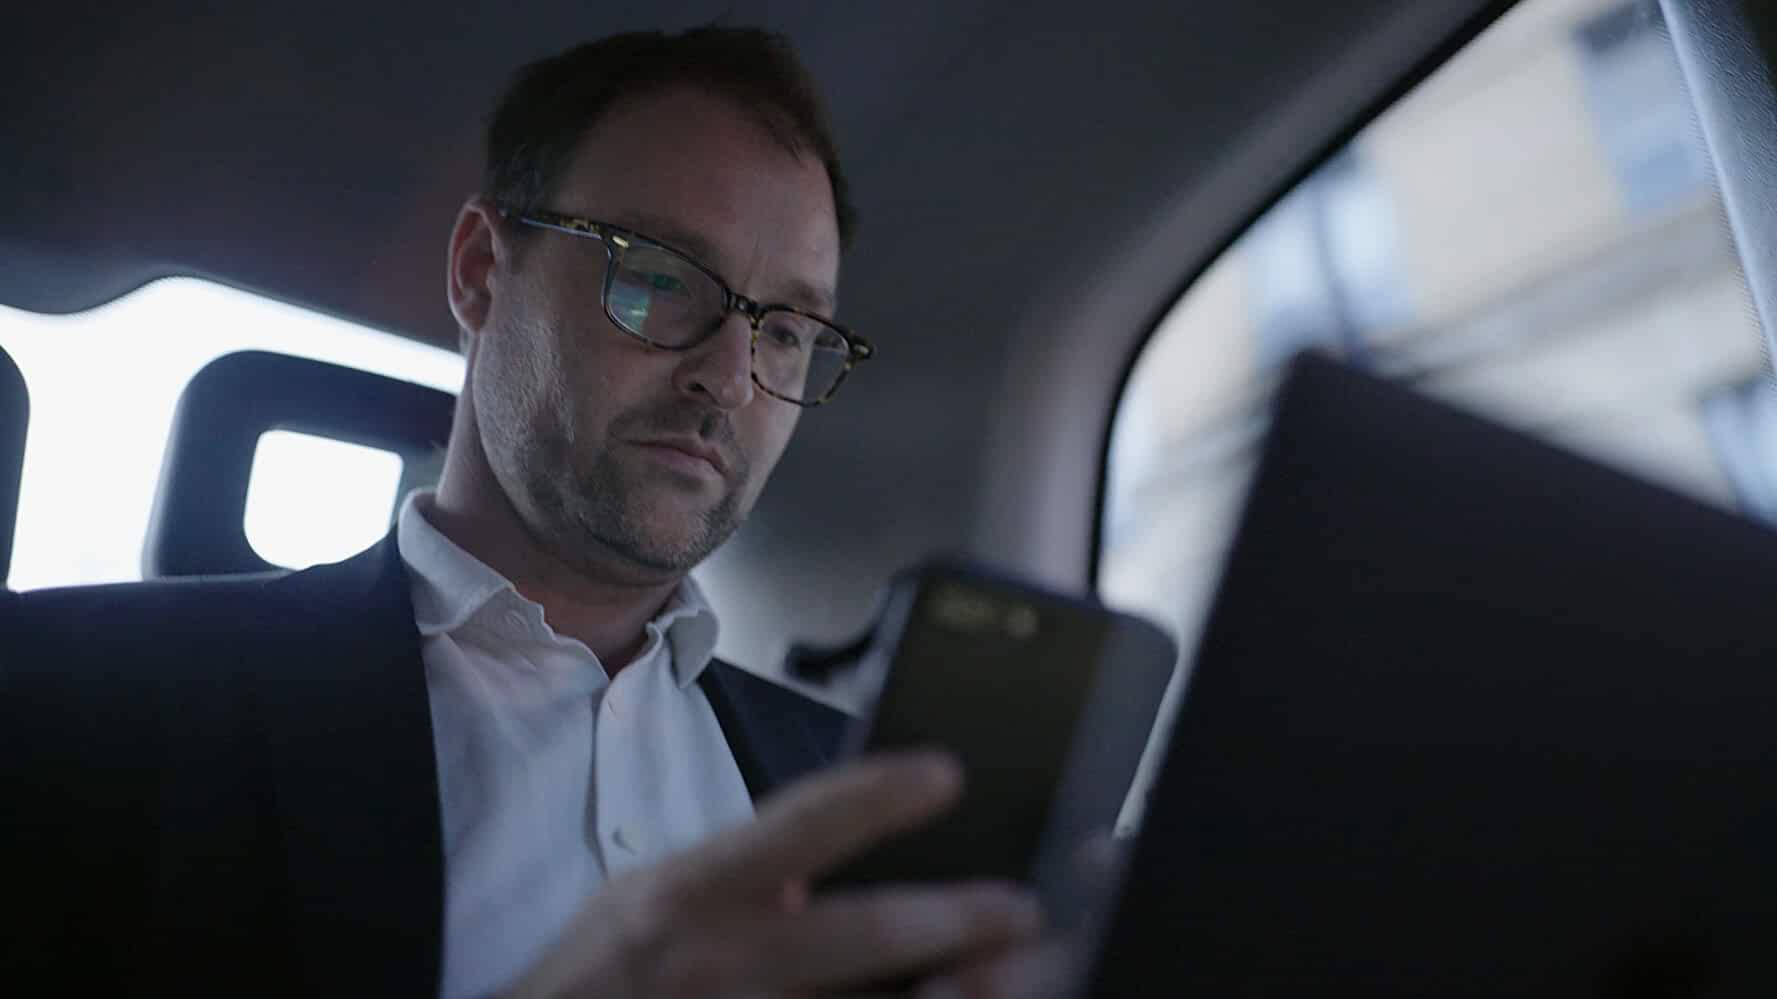 Paul Hilder in The Great Hack (2019)